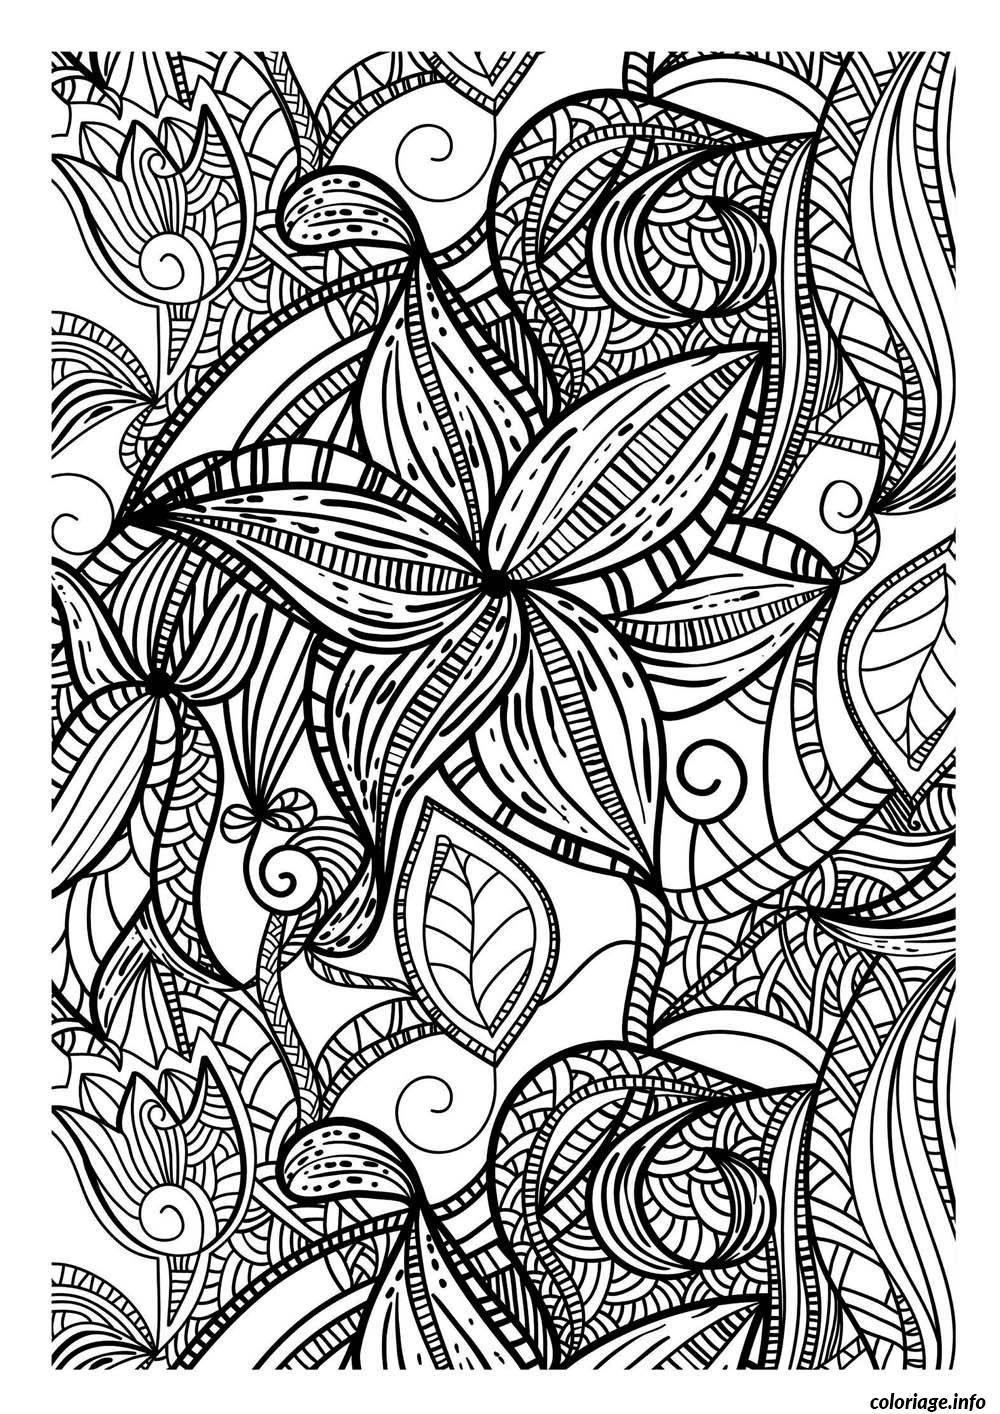 Dessin adulte dessin 60 Coloriage Gratuit à Imprimer